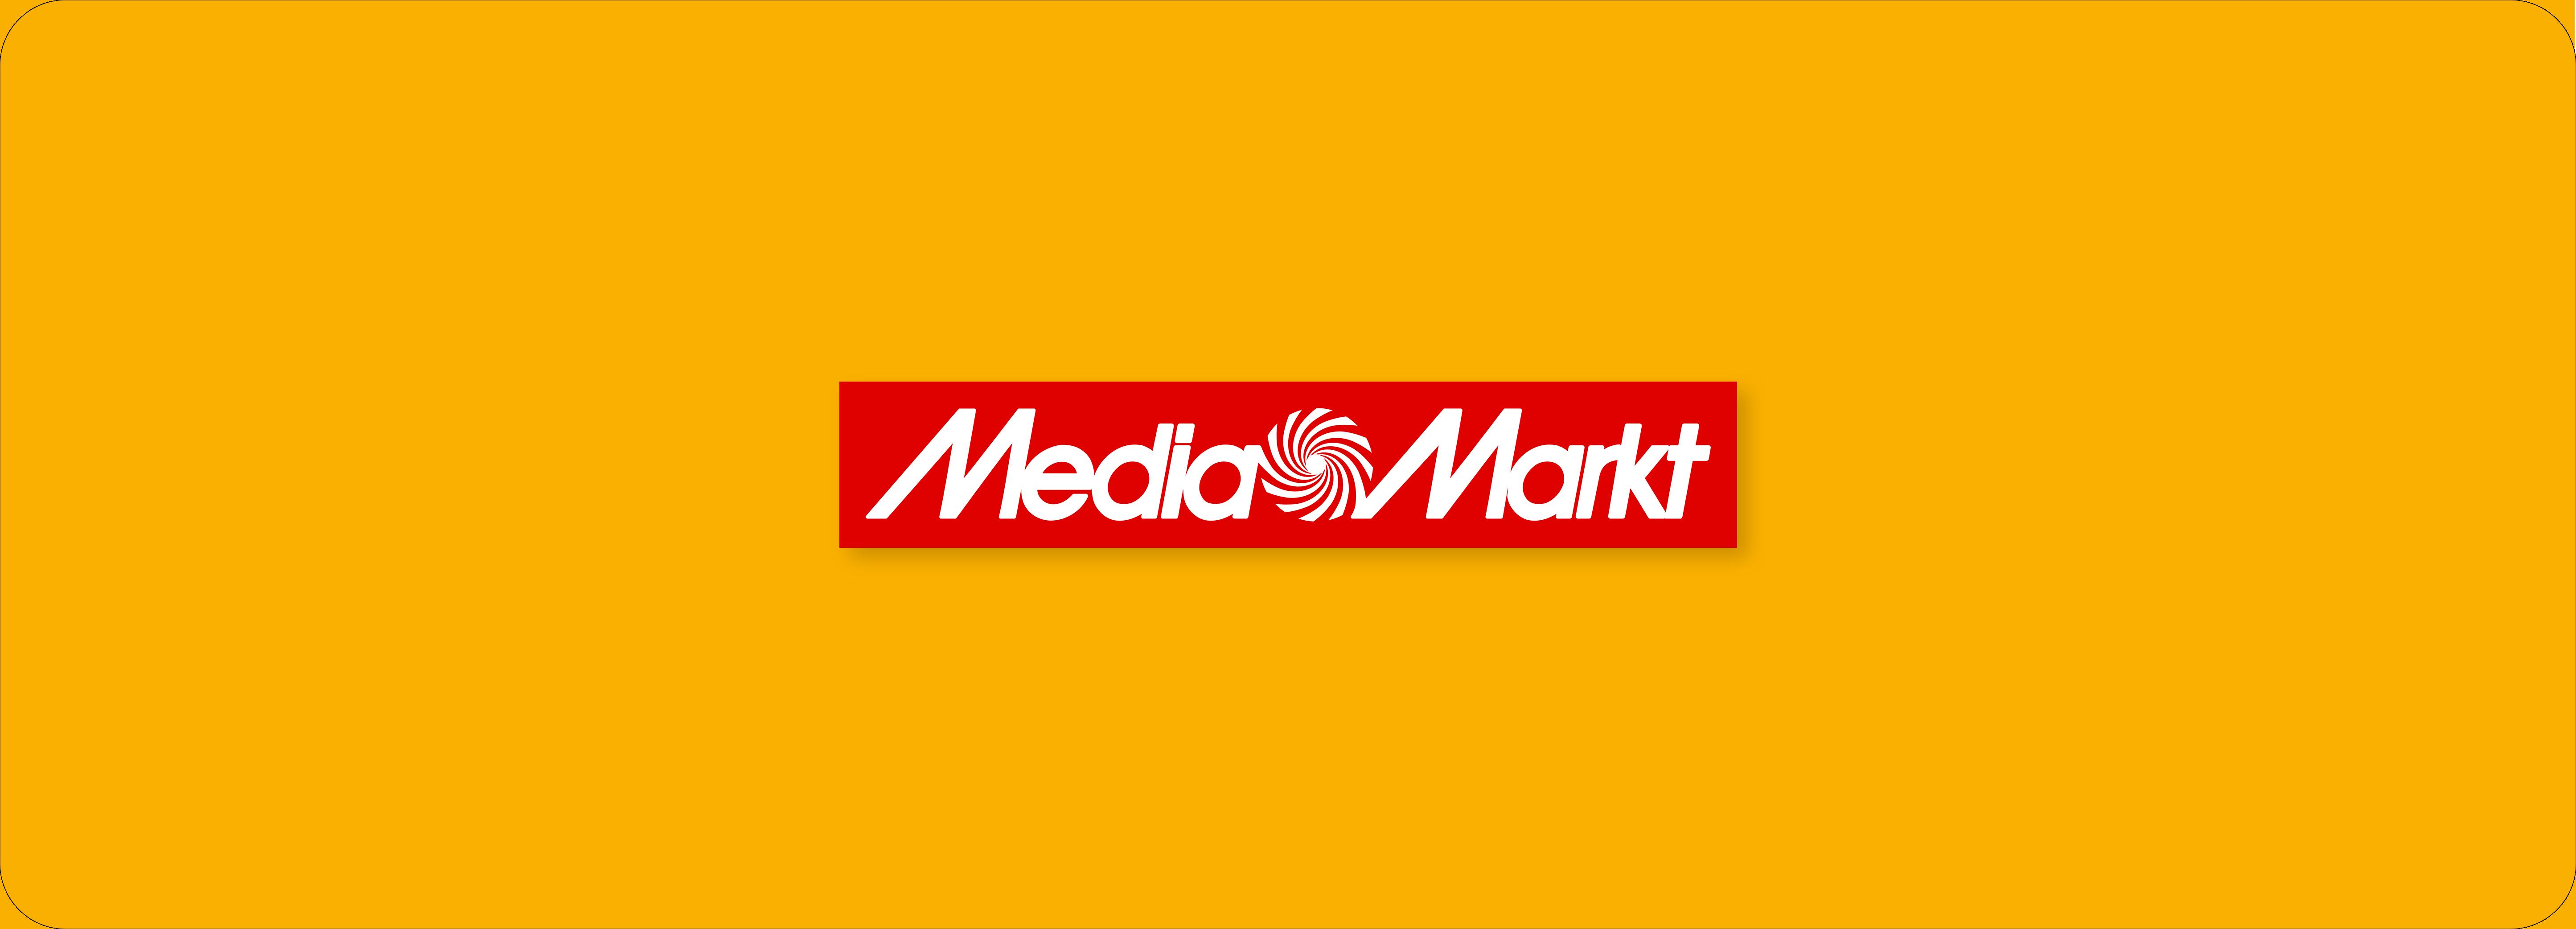 JBTS x MEDIA MARKT